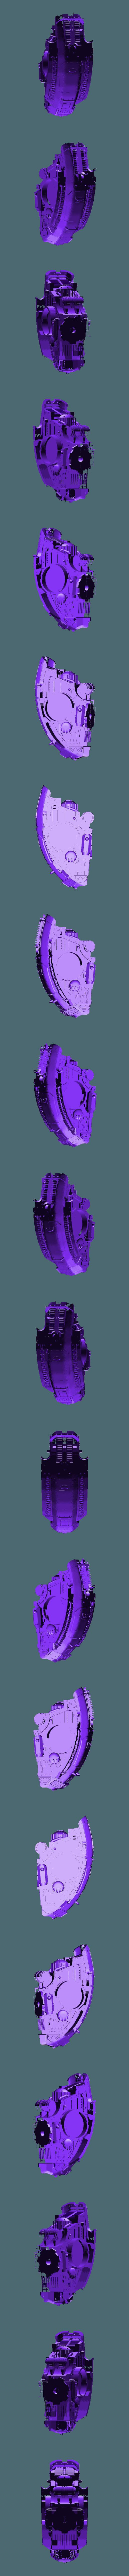 Aztec_Armiger_body.stl Download free STL file Aztec Armor Bearer  - Conversion Kit • Model to 3D print, ErikTheHeretek